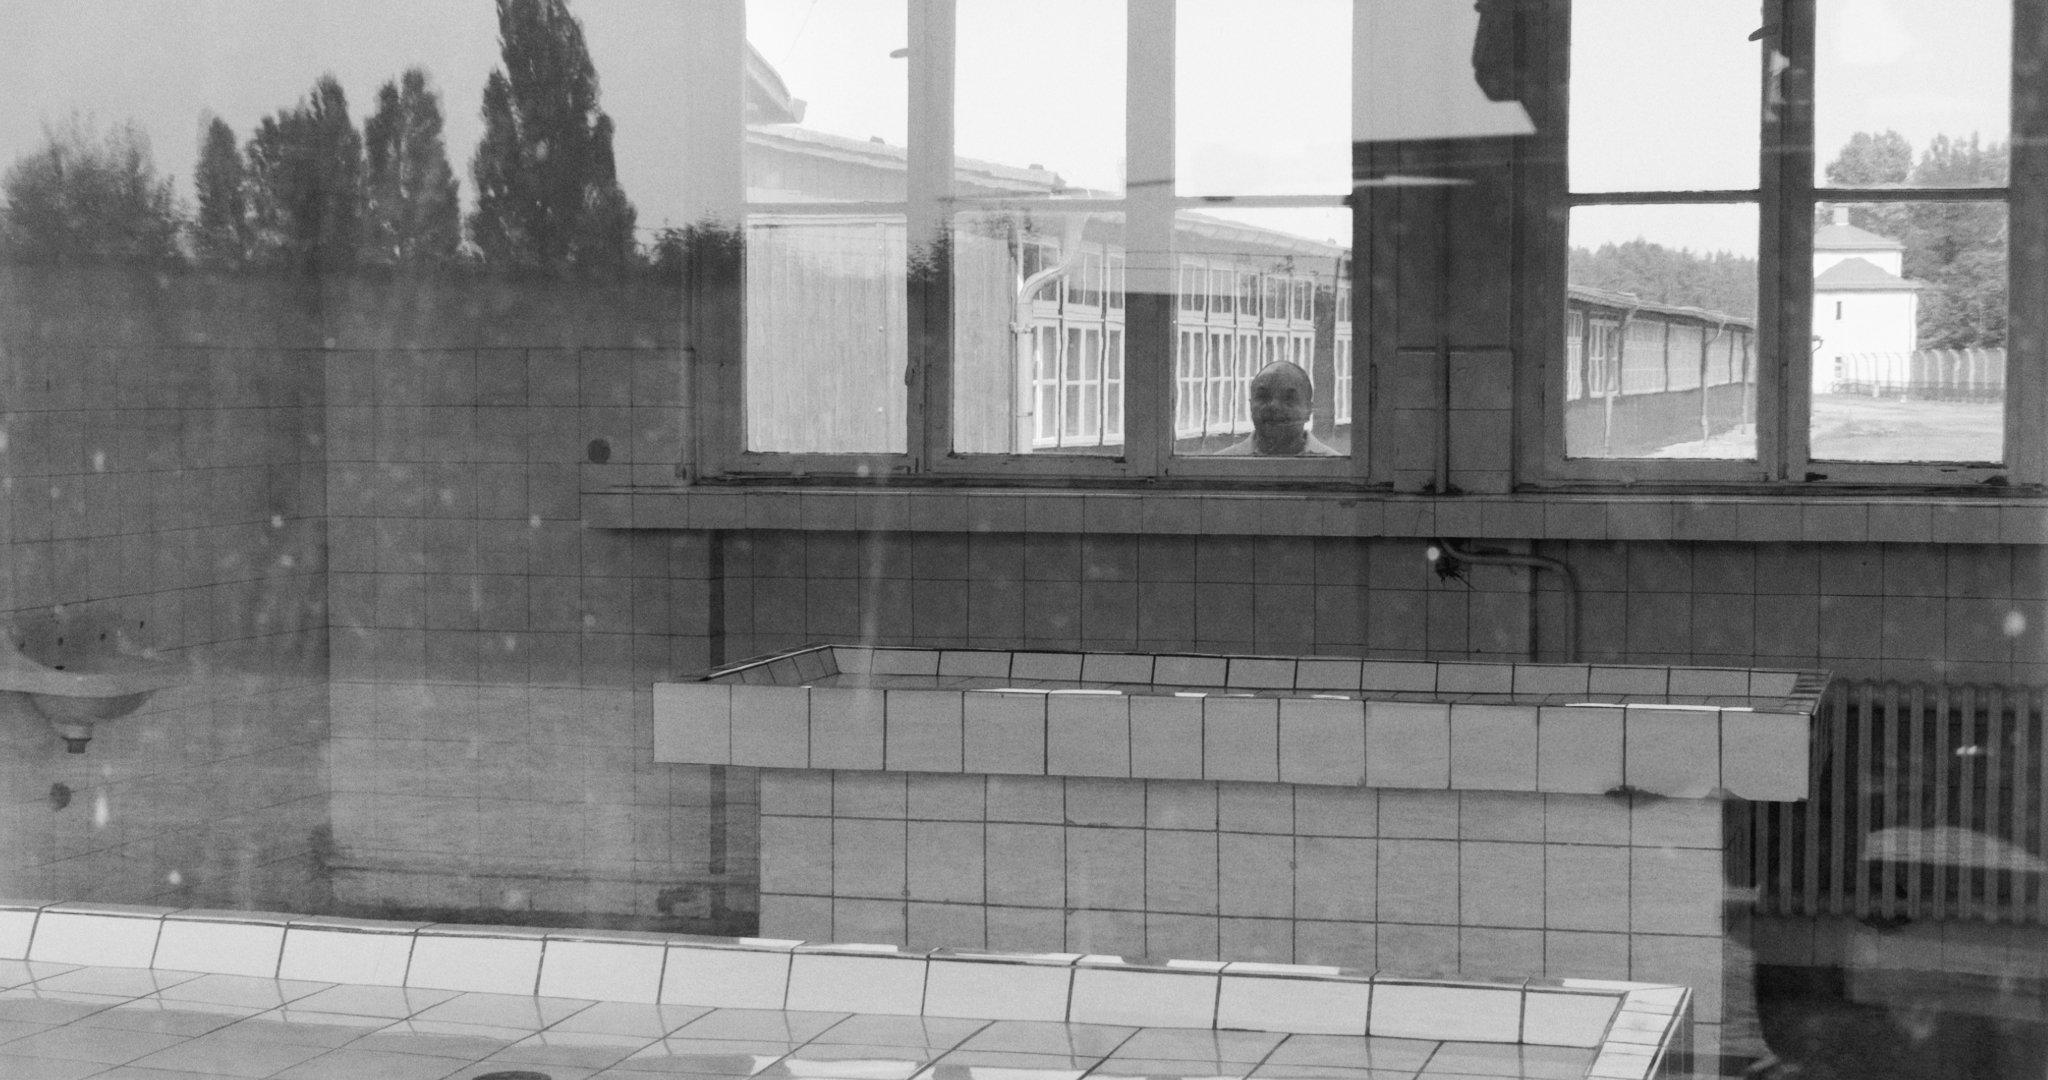 Szene aus dem Film Austerlitz